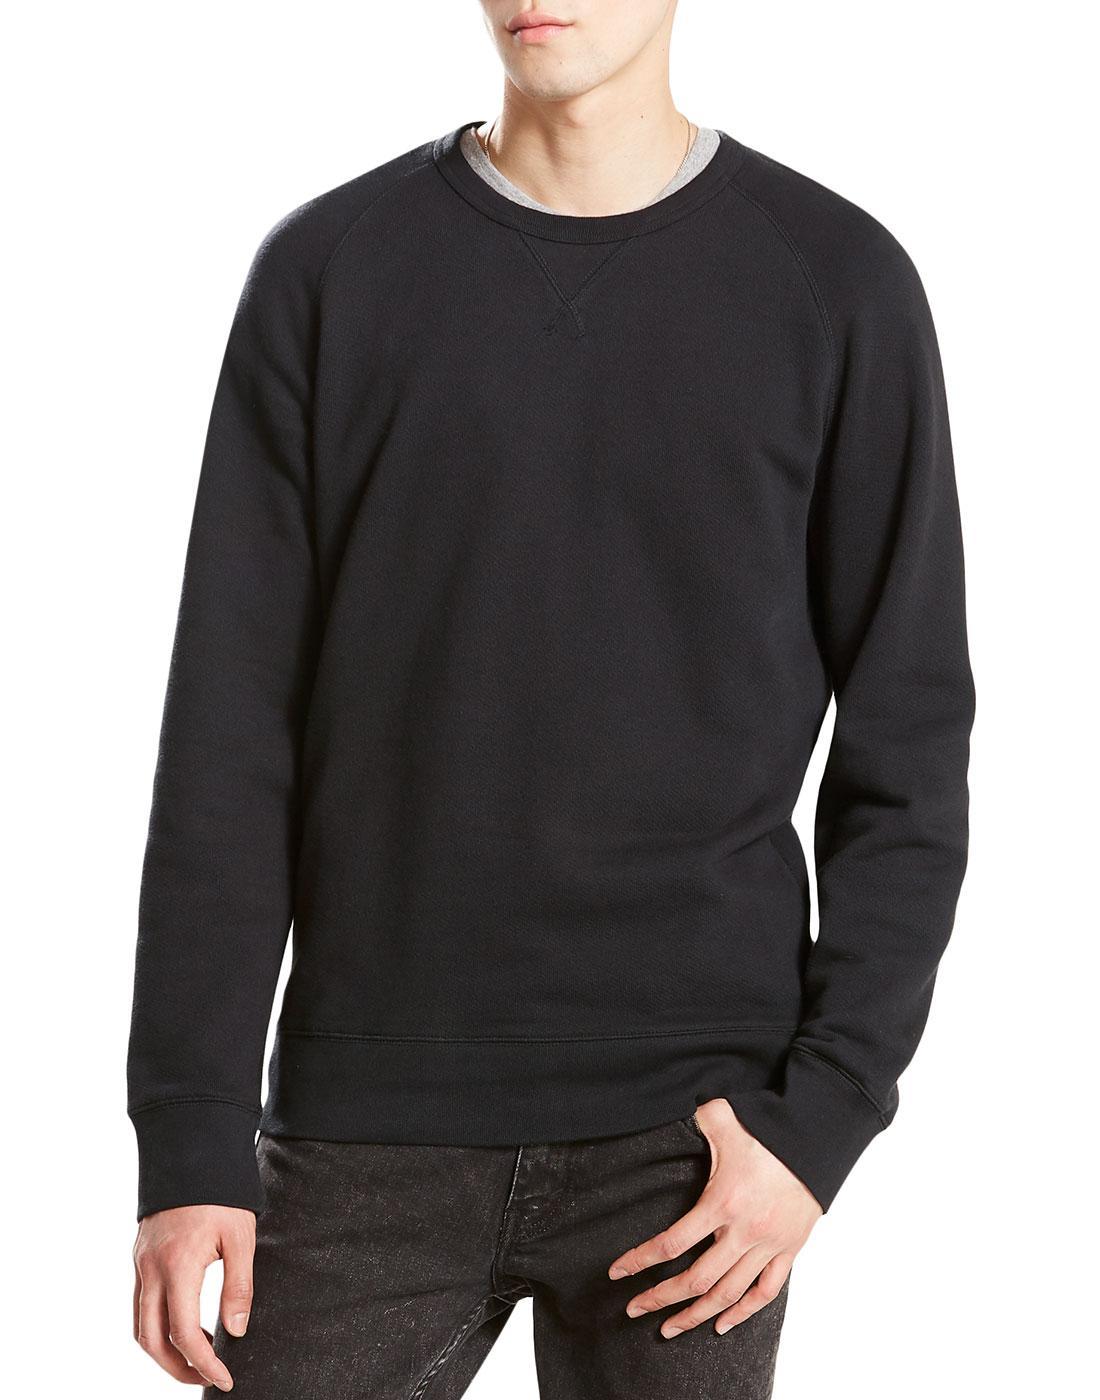 LEVI'S Retro 70s Original Crew Neck Sweatshirt (B)